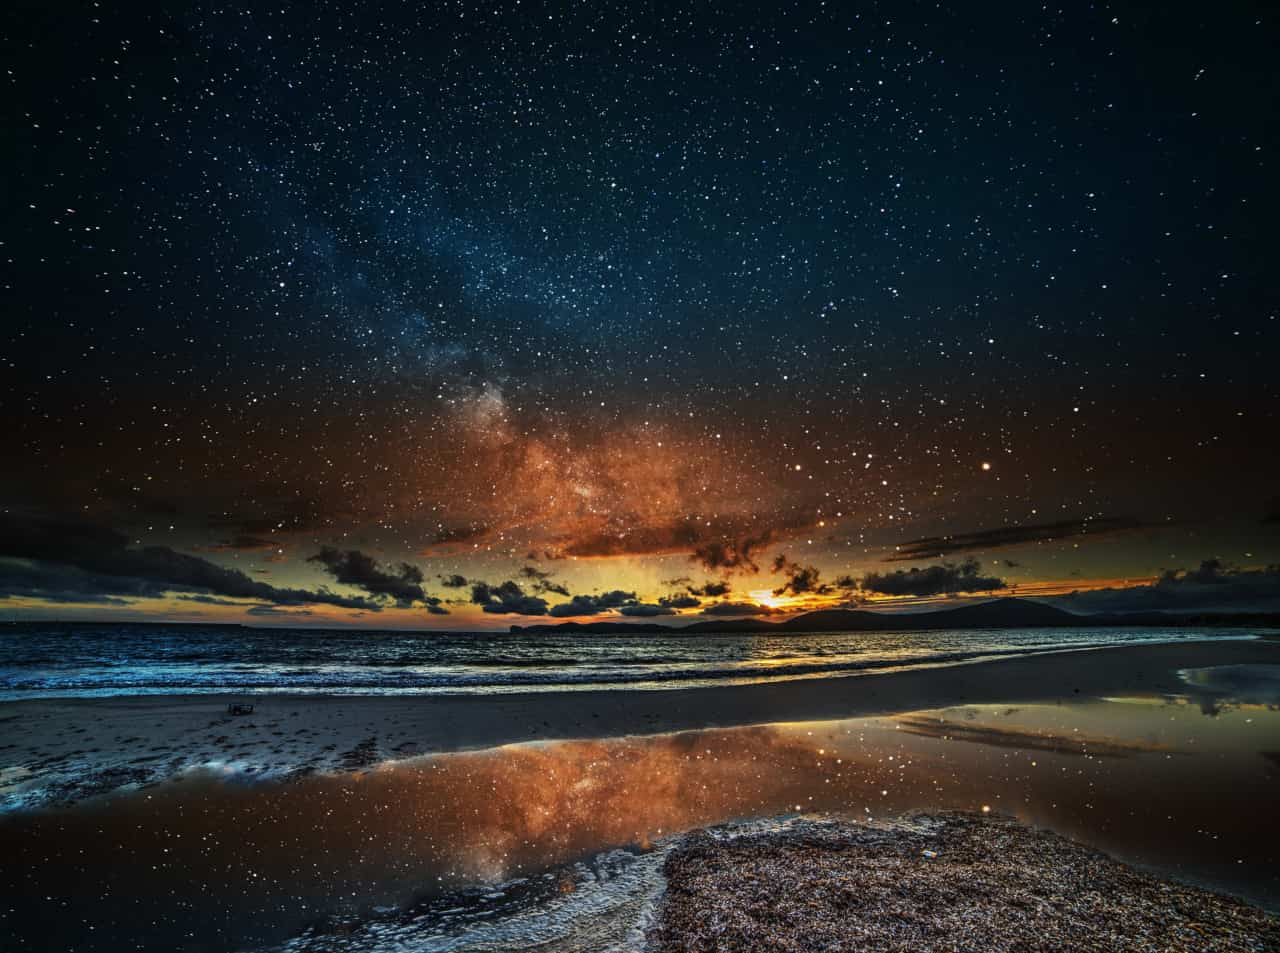 stelle cadenti spiagge